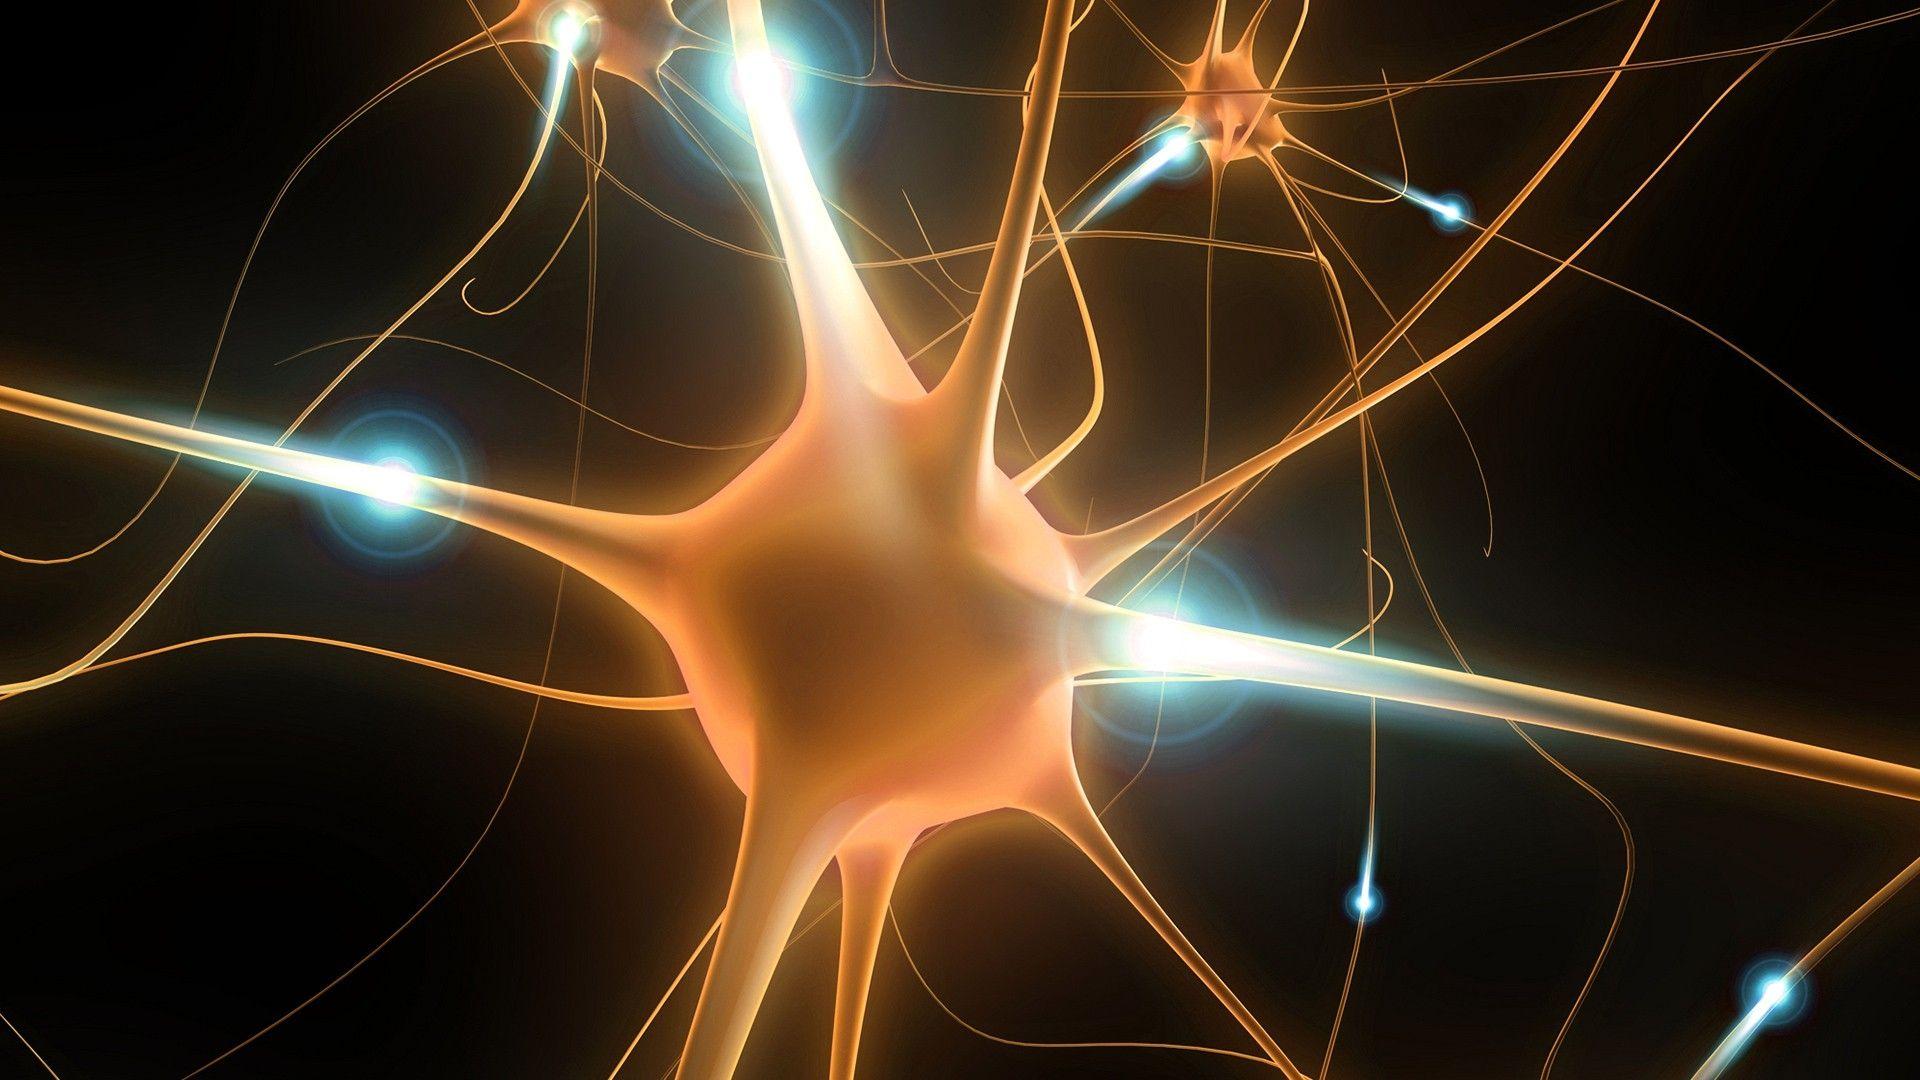 Brain download wallpaper image